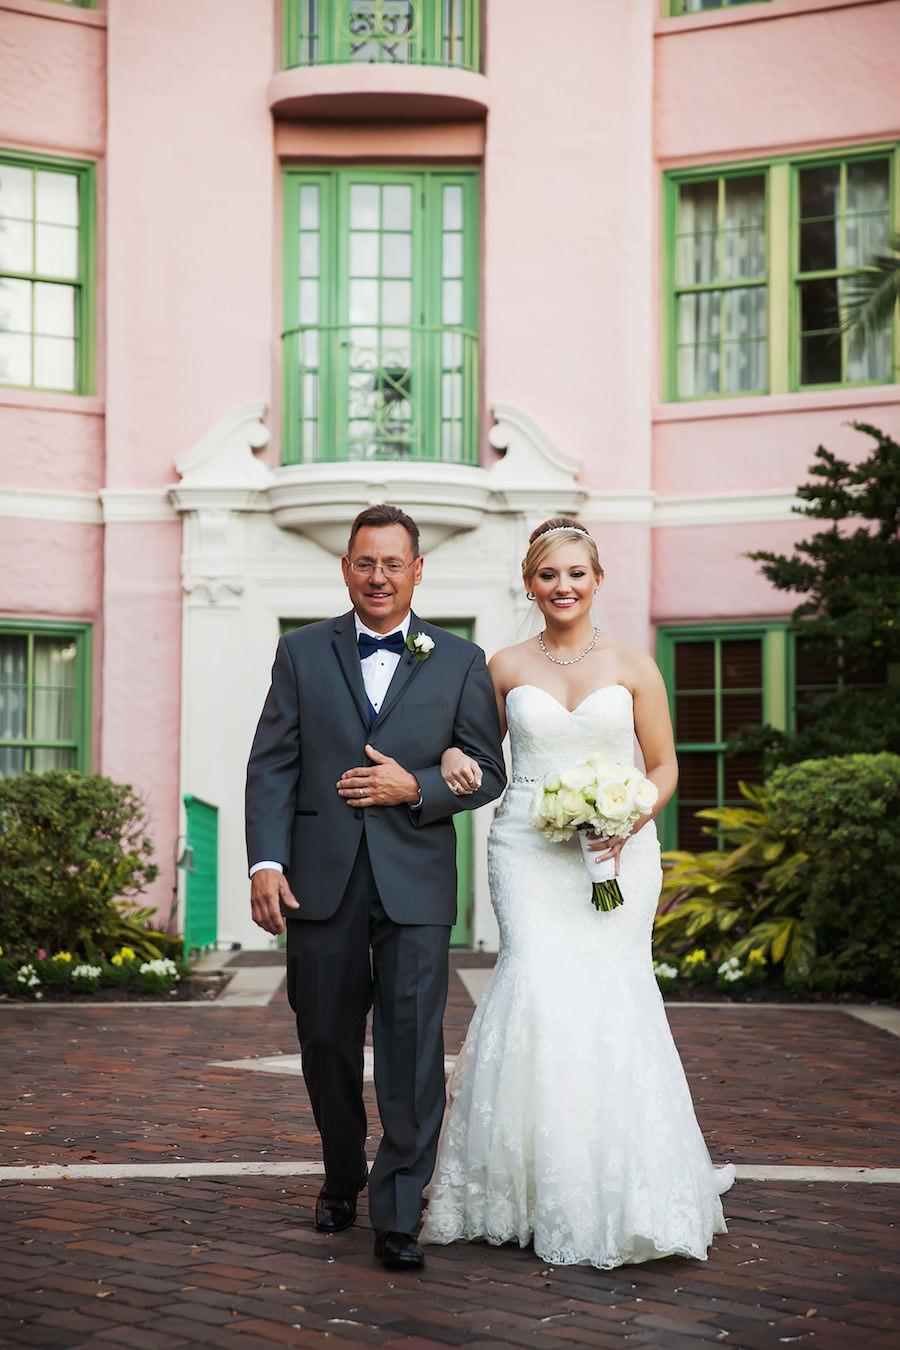 Bride and Father Walking Down The Aisle Wedding Portrait | St. Pete Wedding Ceremony Venue Vinoy Renaissance | Limelight Photography